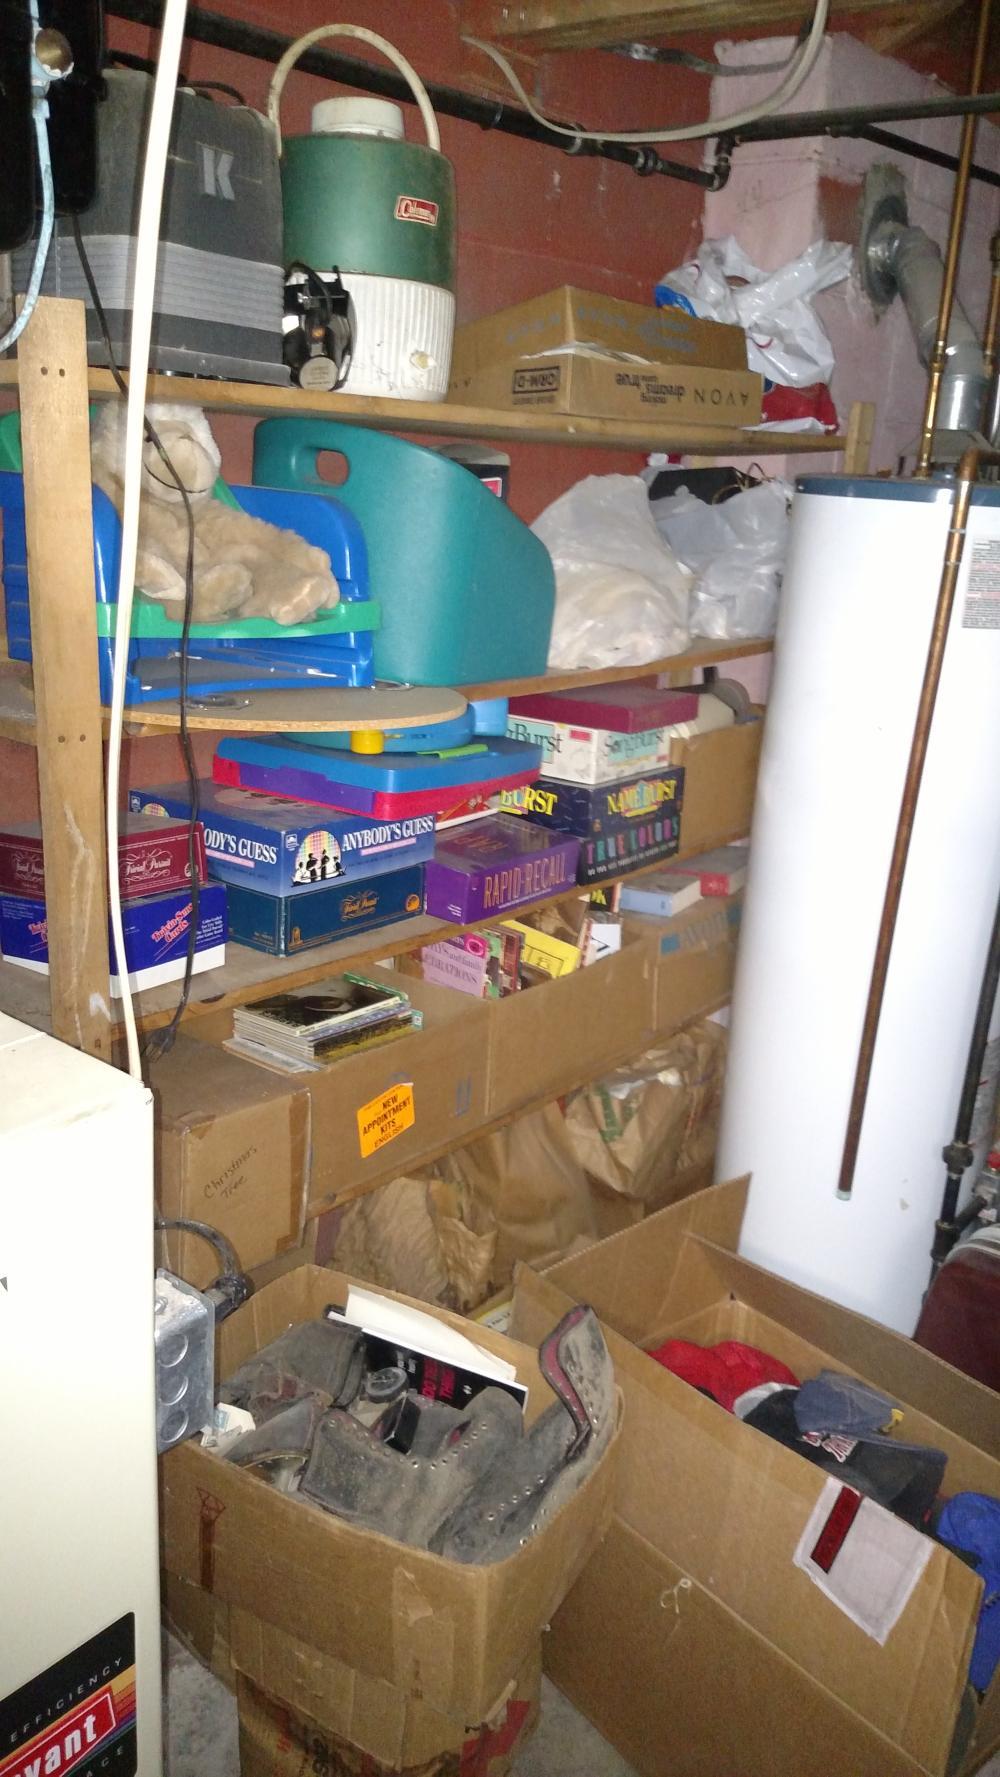 shelf contents - Coleman cooler, games, books, ice skates, kid's items, ball hats, pot luck misc. job lot